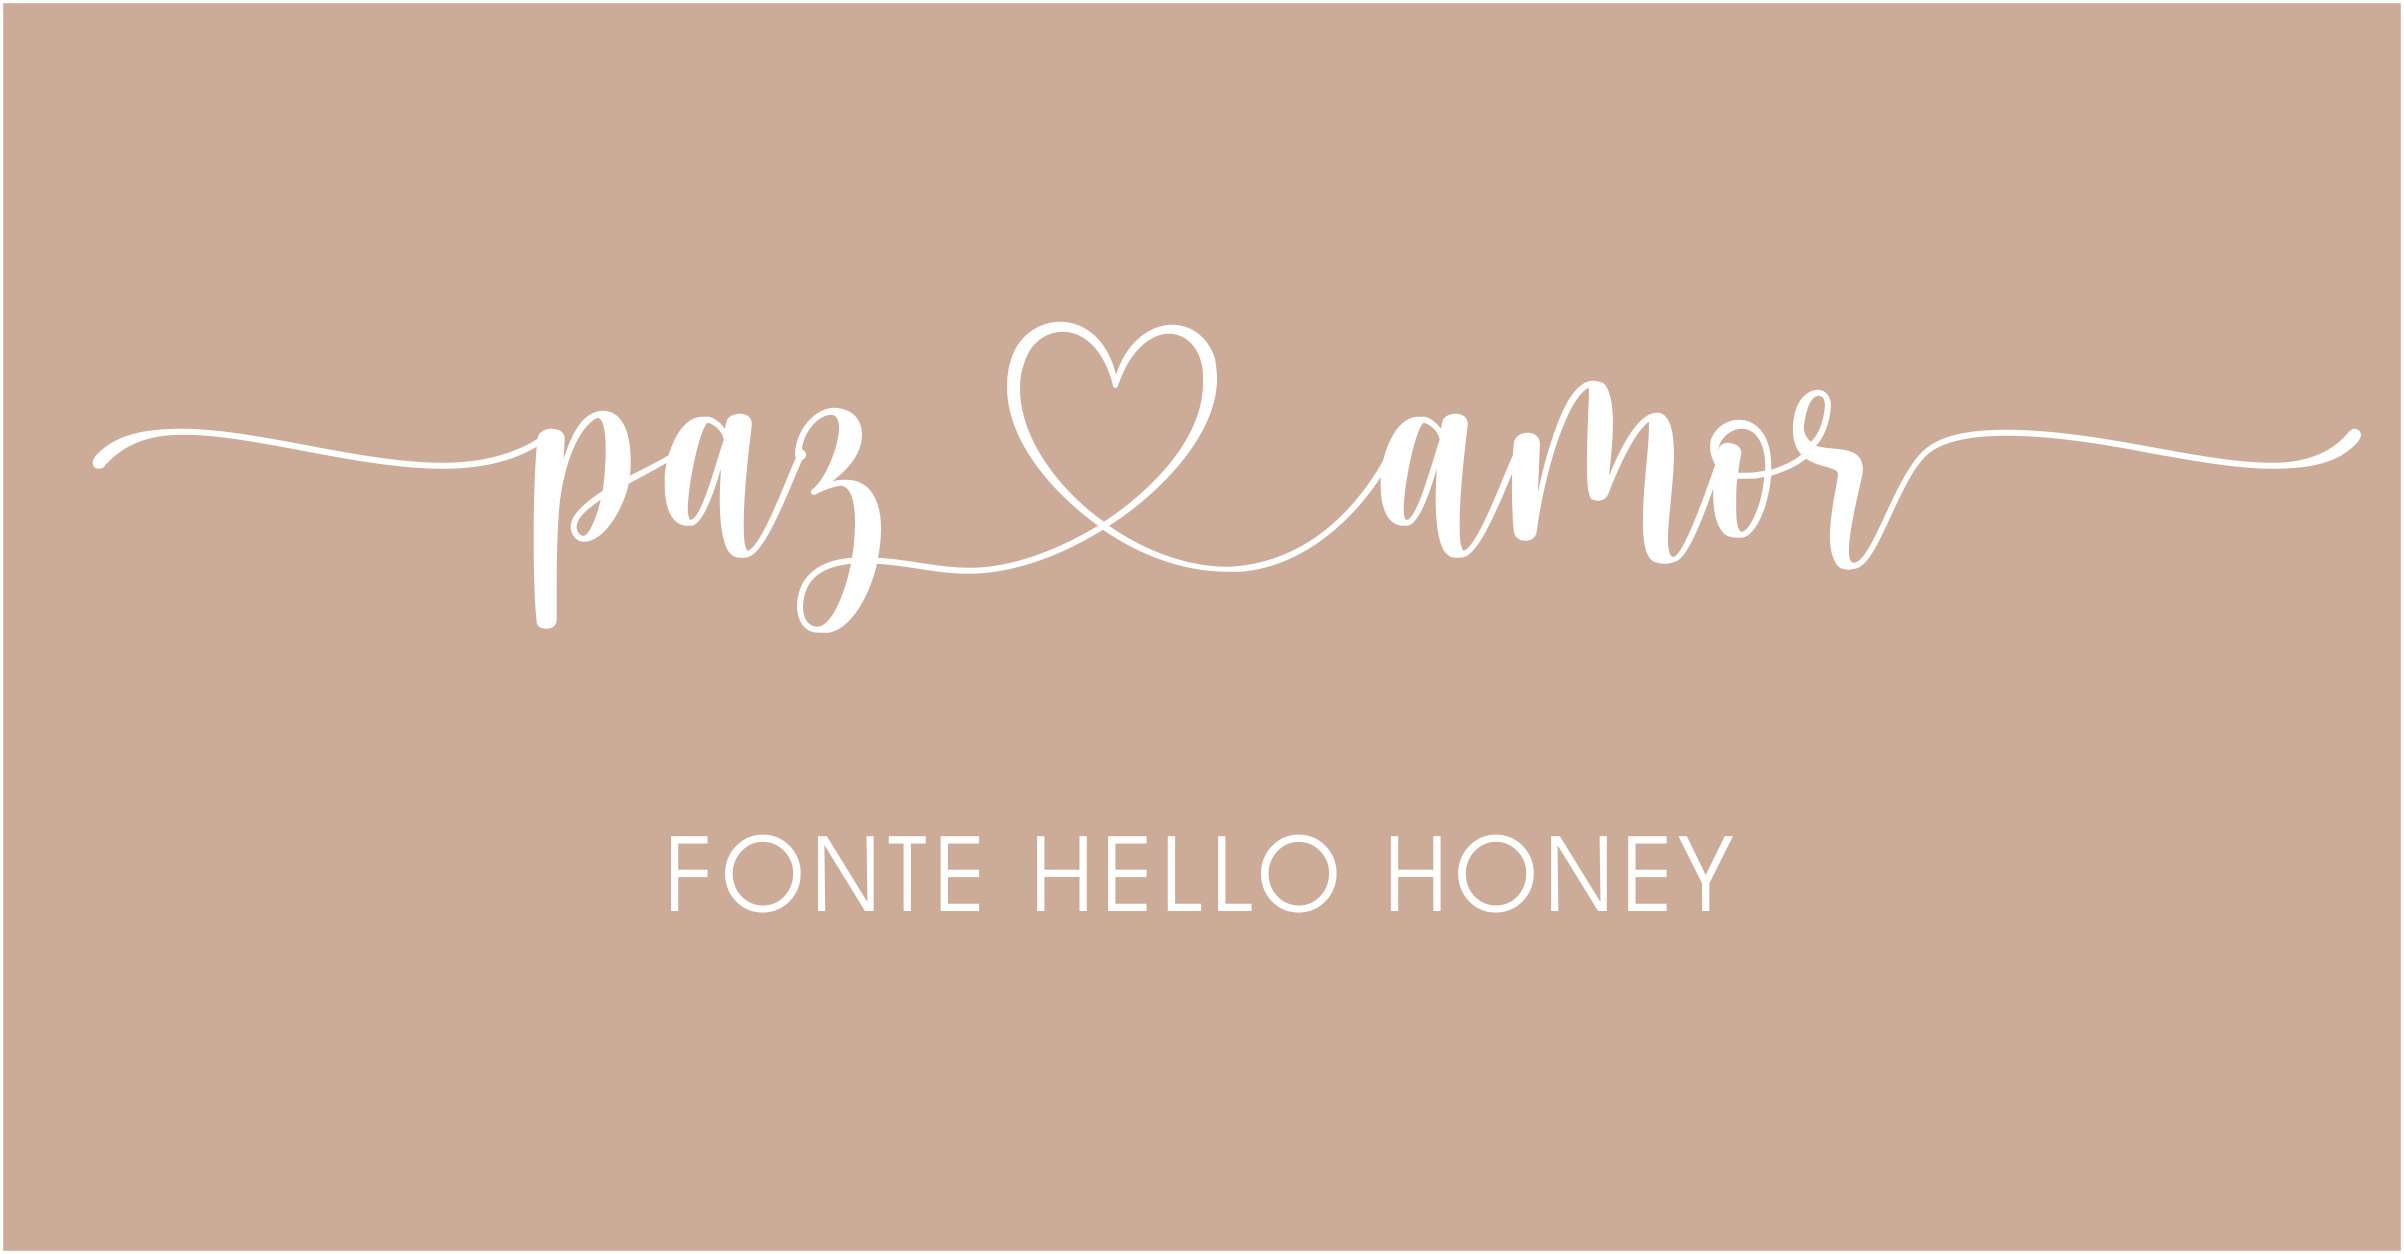 Letras com rabinhos para convites de casamento Hello Honey